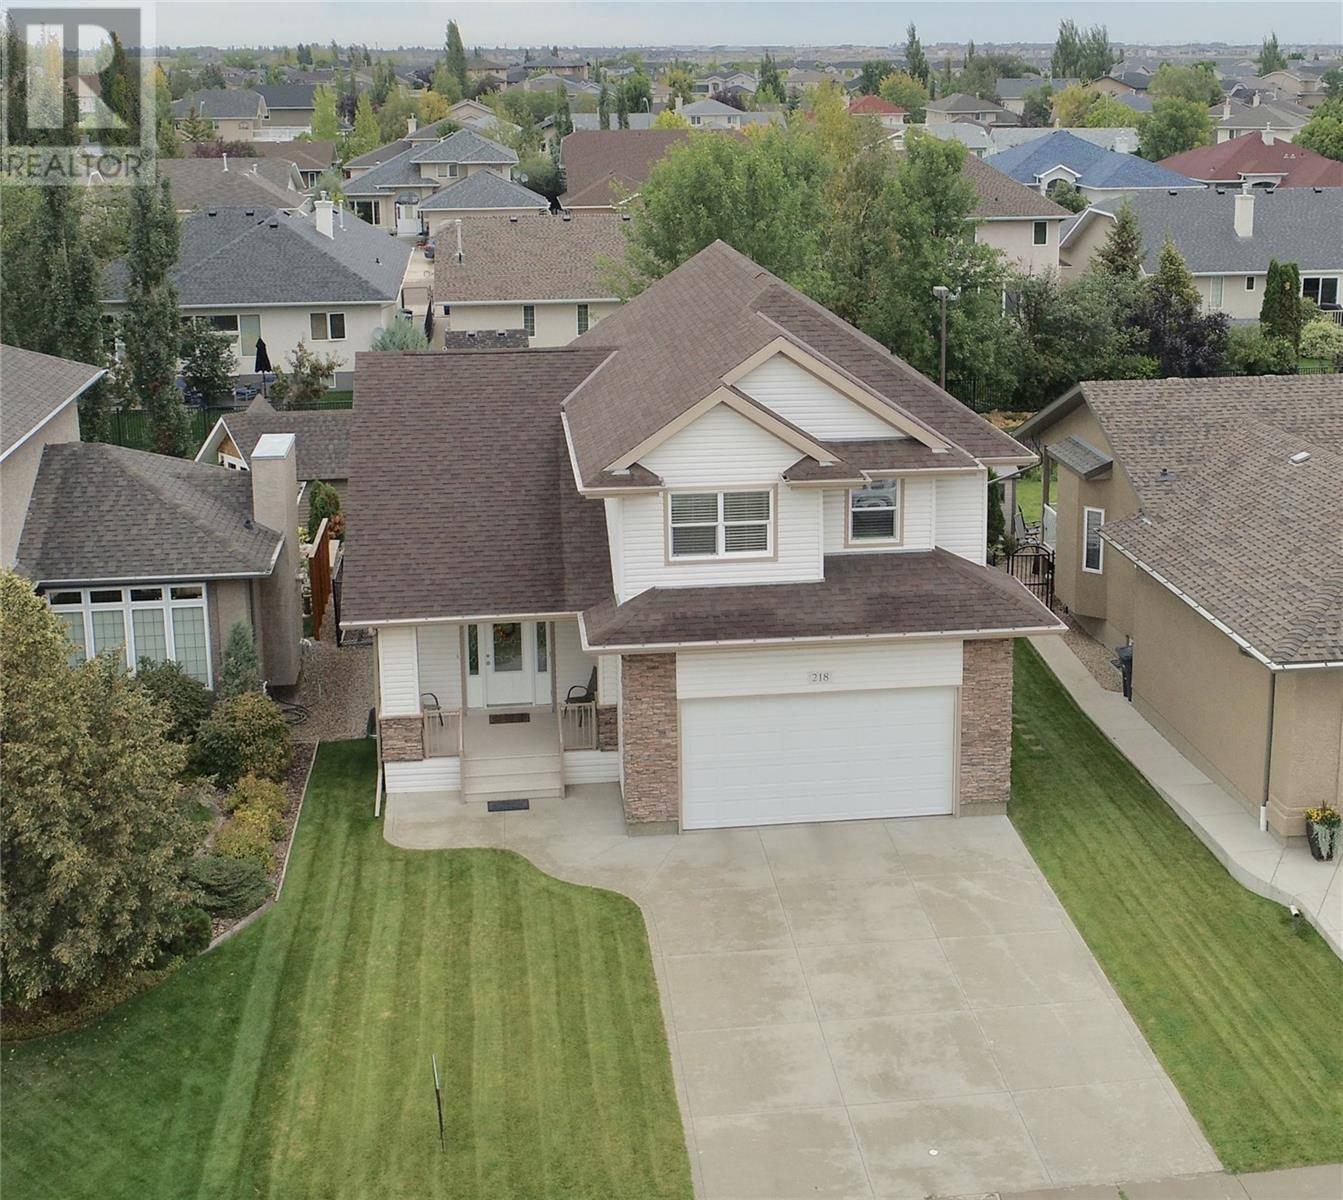 House for sale at 218 Brookdale Cres Saskatoon Saskatchewan - MLS: SK783693